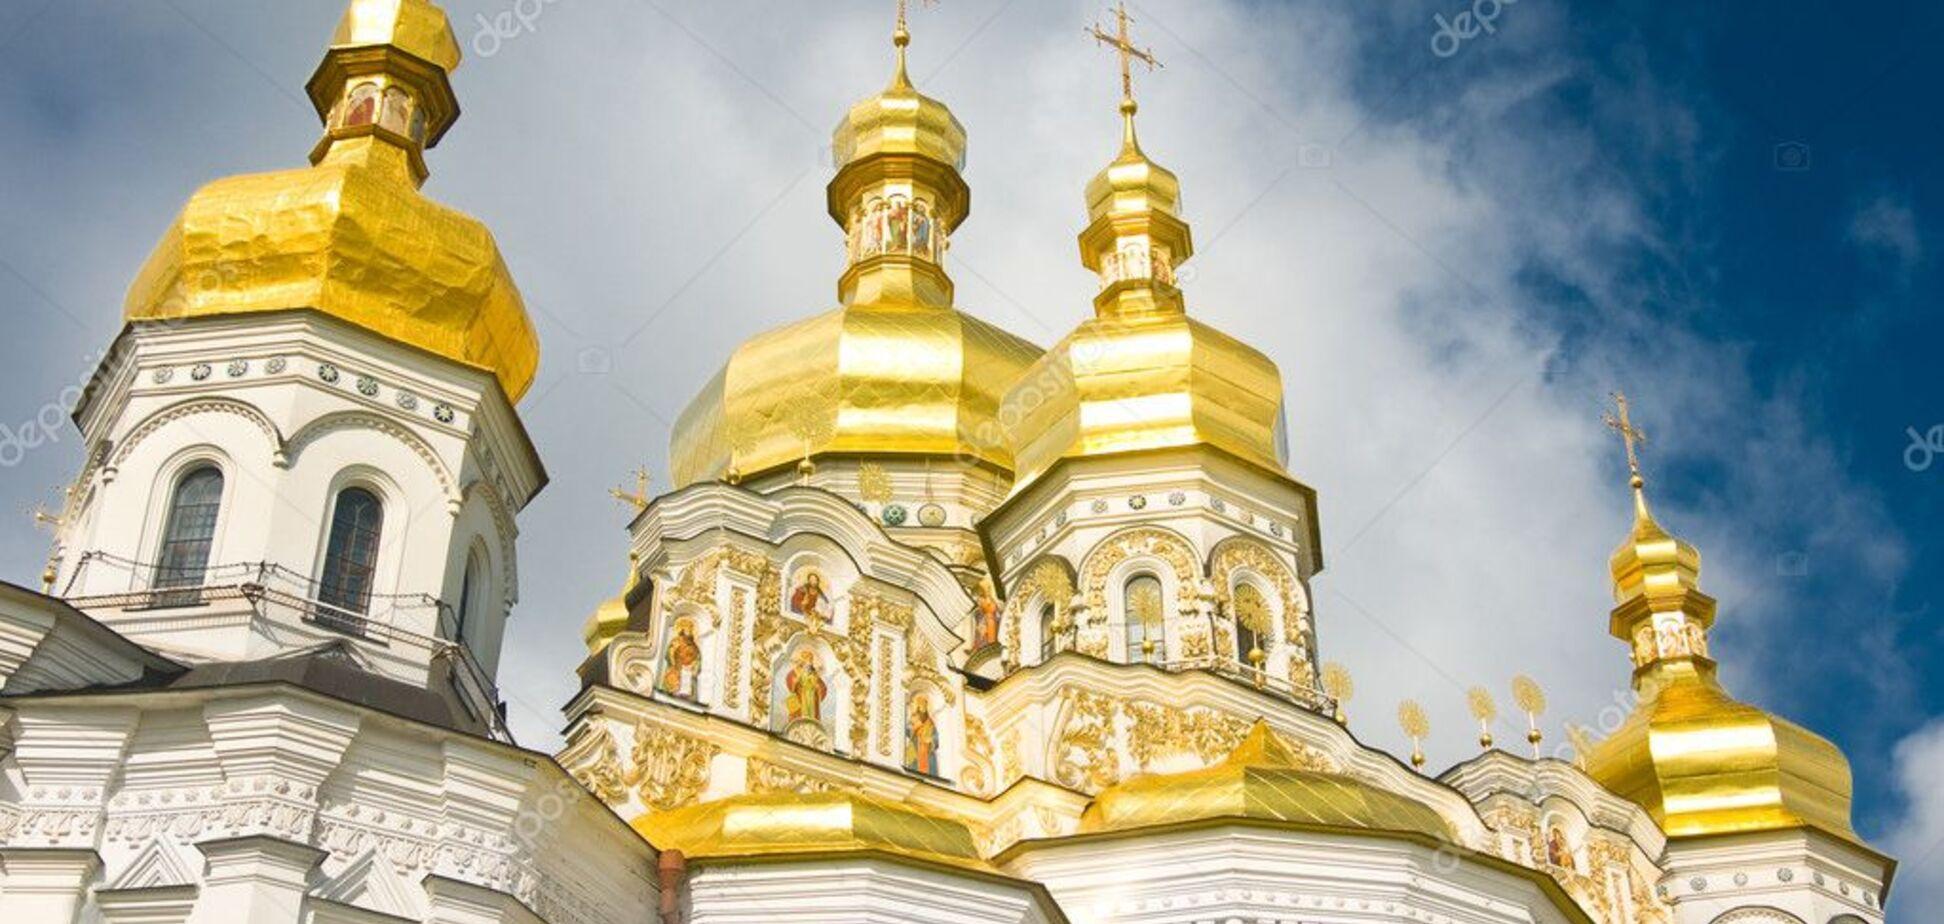 Українська православна церква стане незалежною від Москви